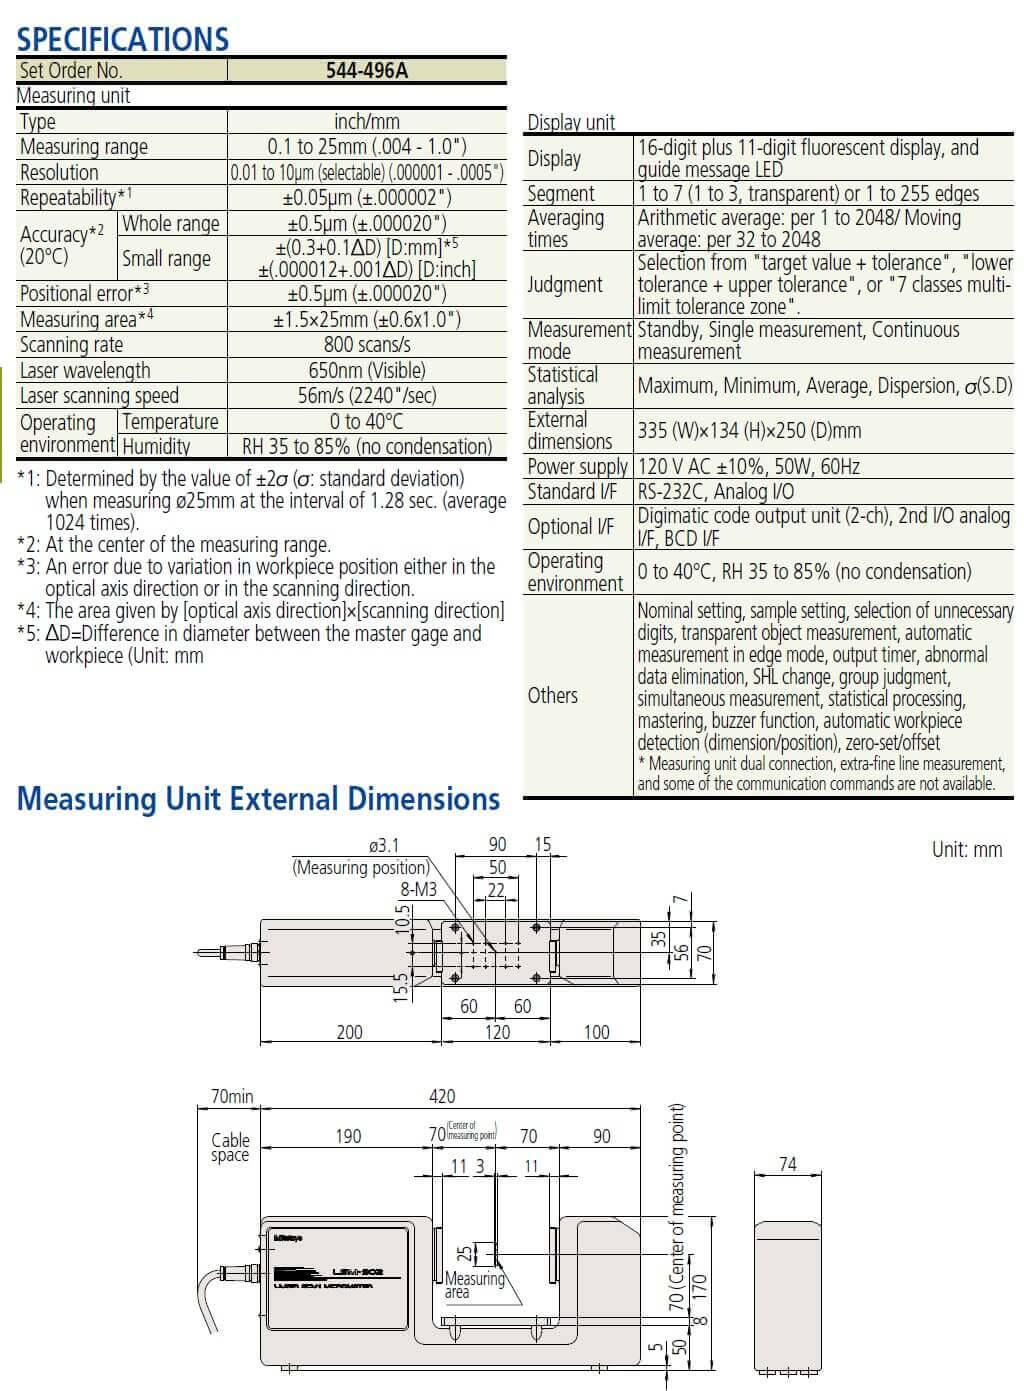 mitutoyo laser micrometer